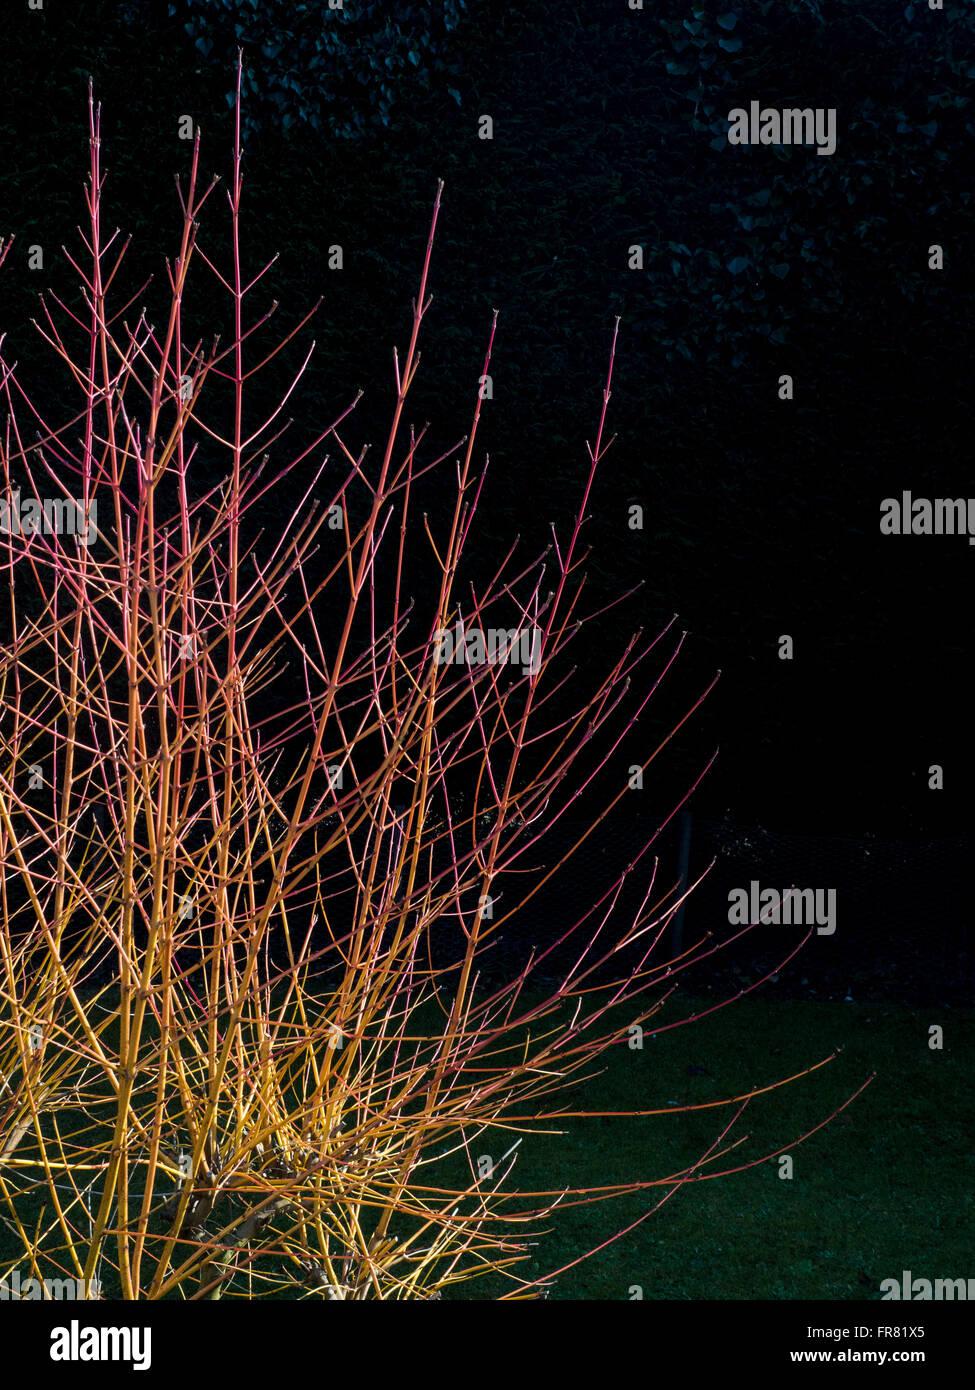 Cornus 'Midwinter Fire stems in winter sunshine - Stock Image